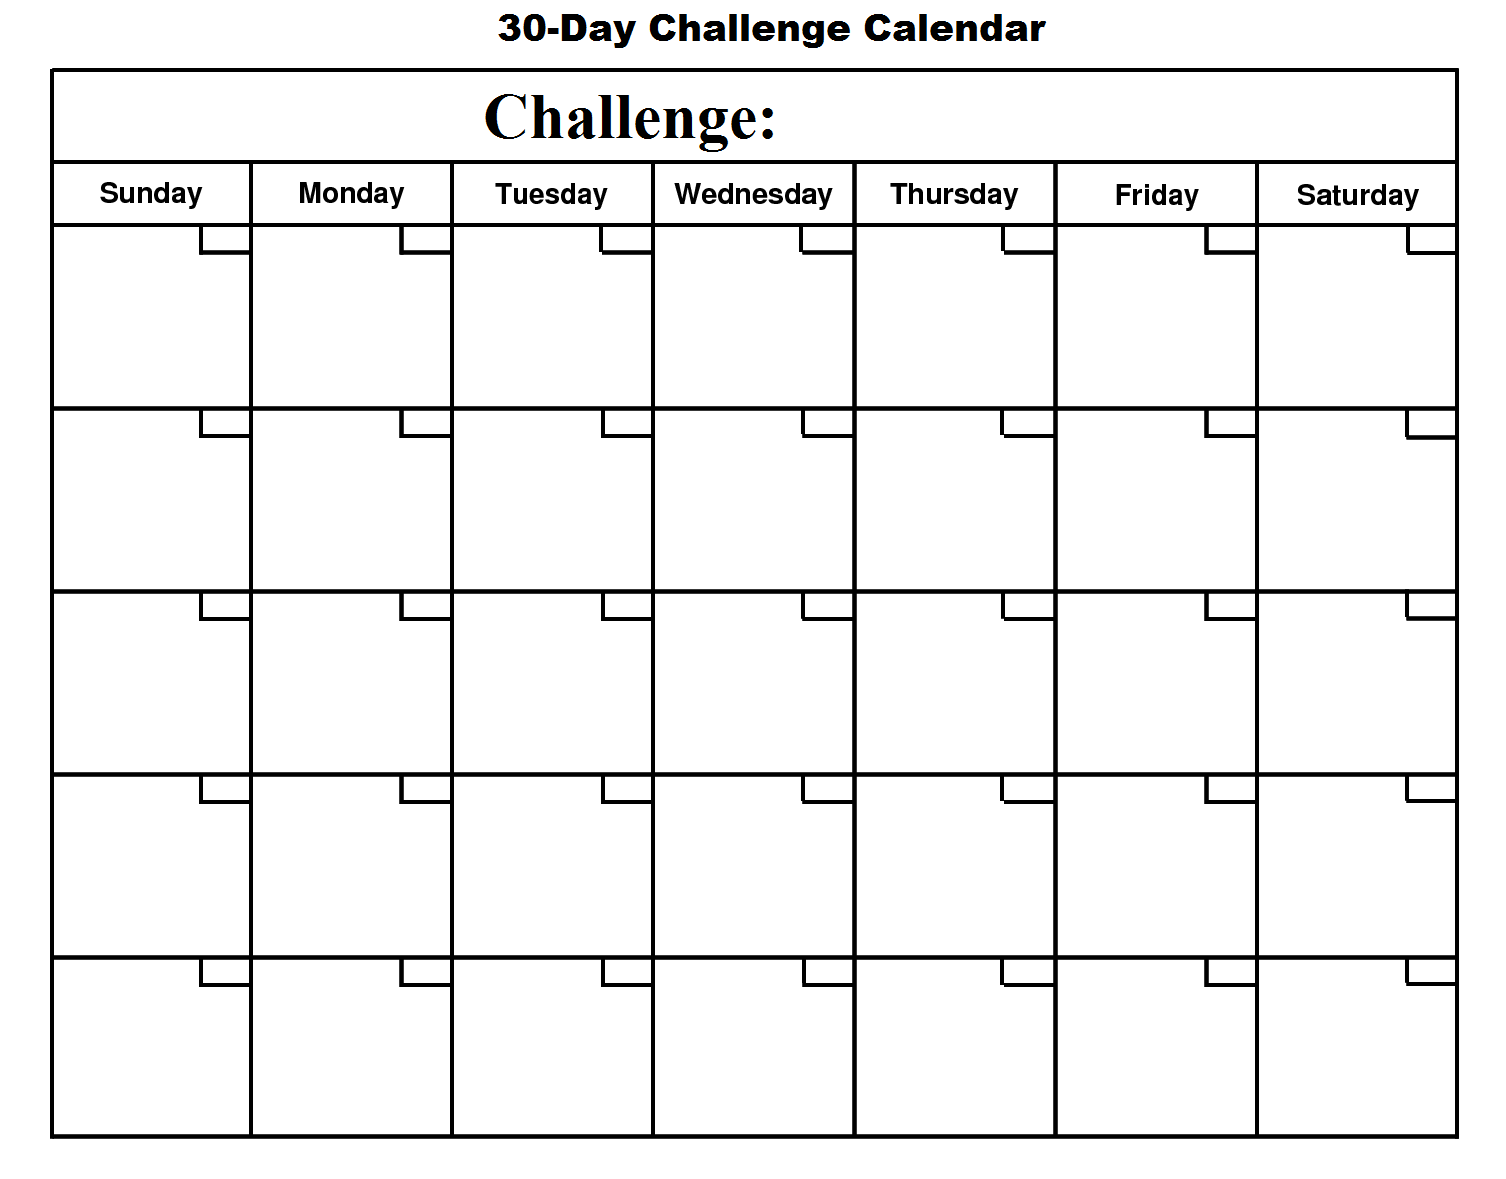 30 Day Calendar - Google Search | Free Calendar Template Regarding Workout Challenge Calendar 30 Day Excel Template